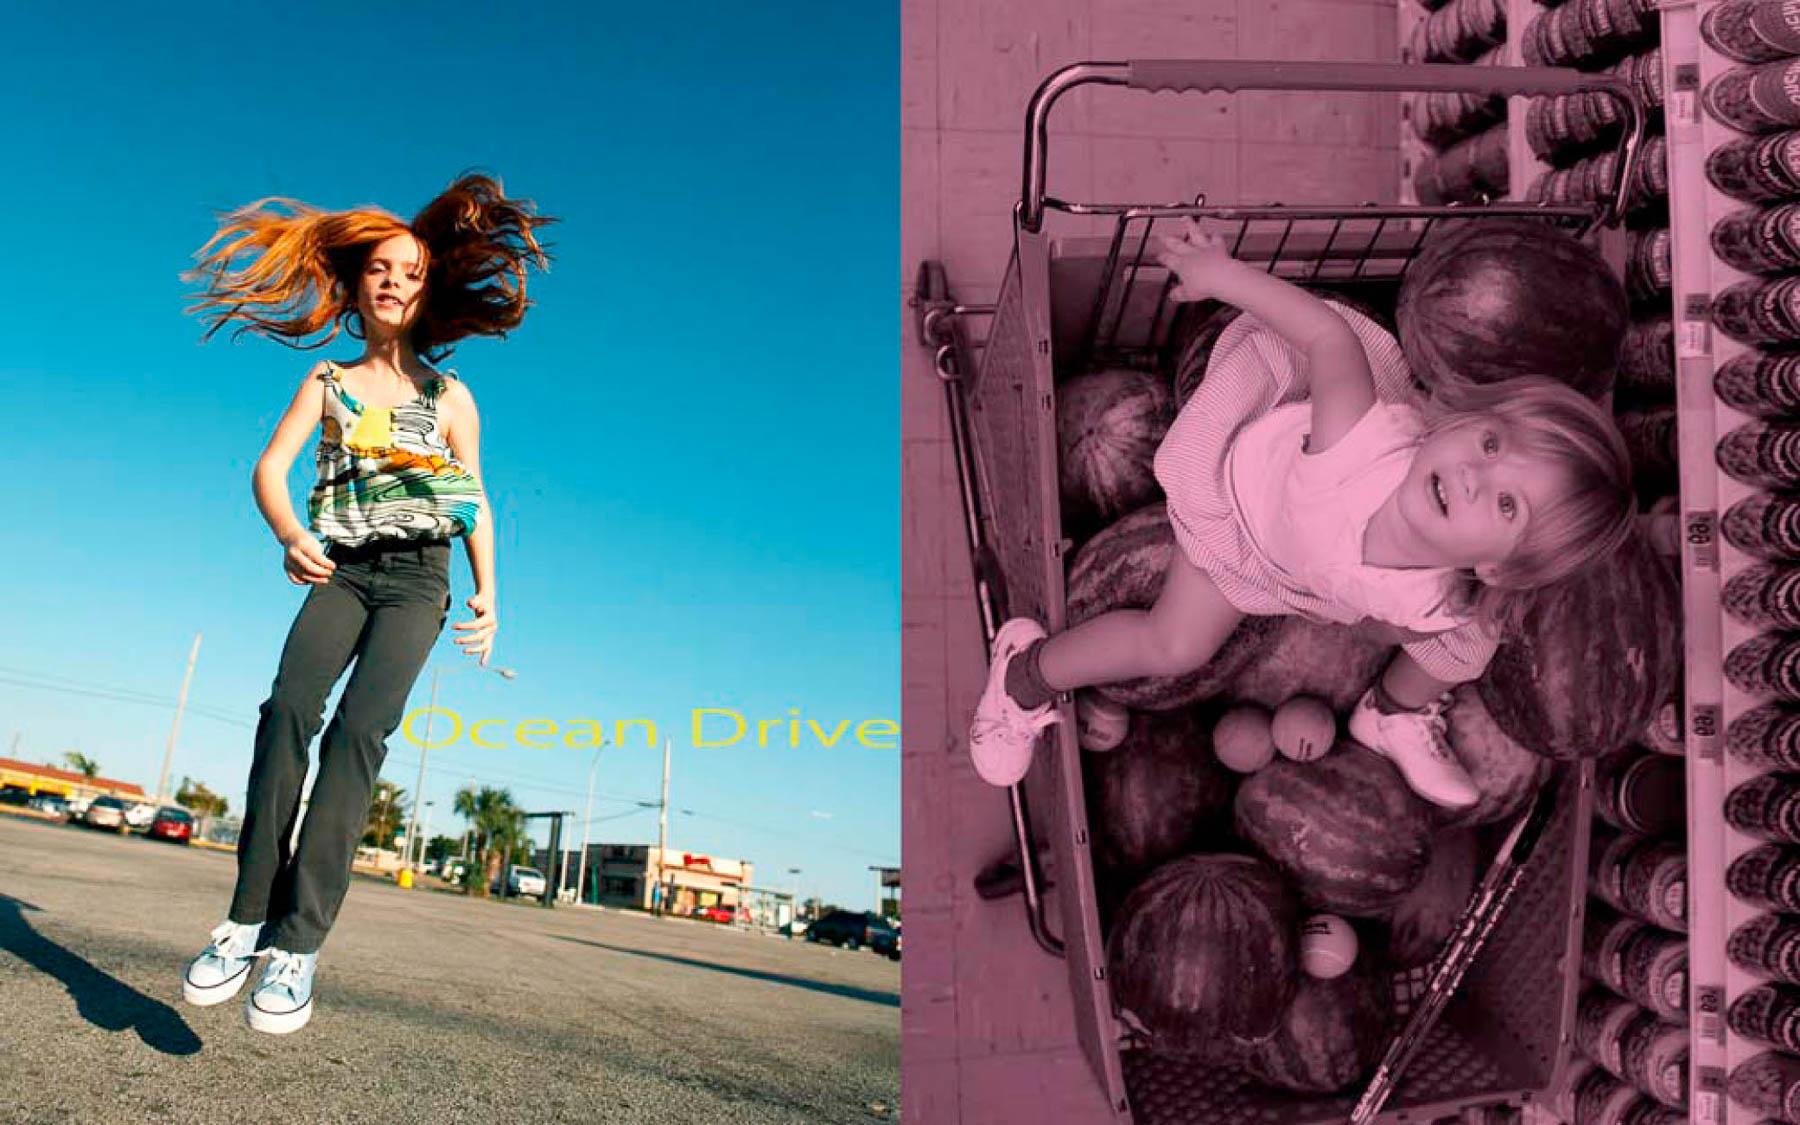 Human behavior - Photography